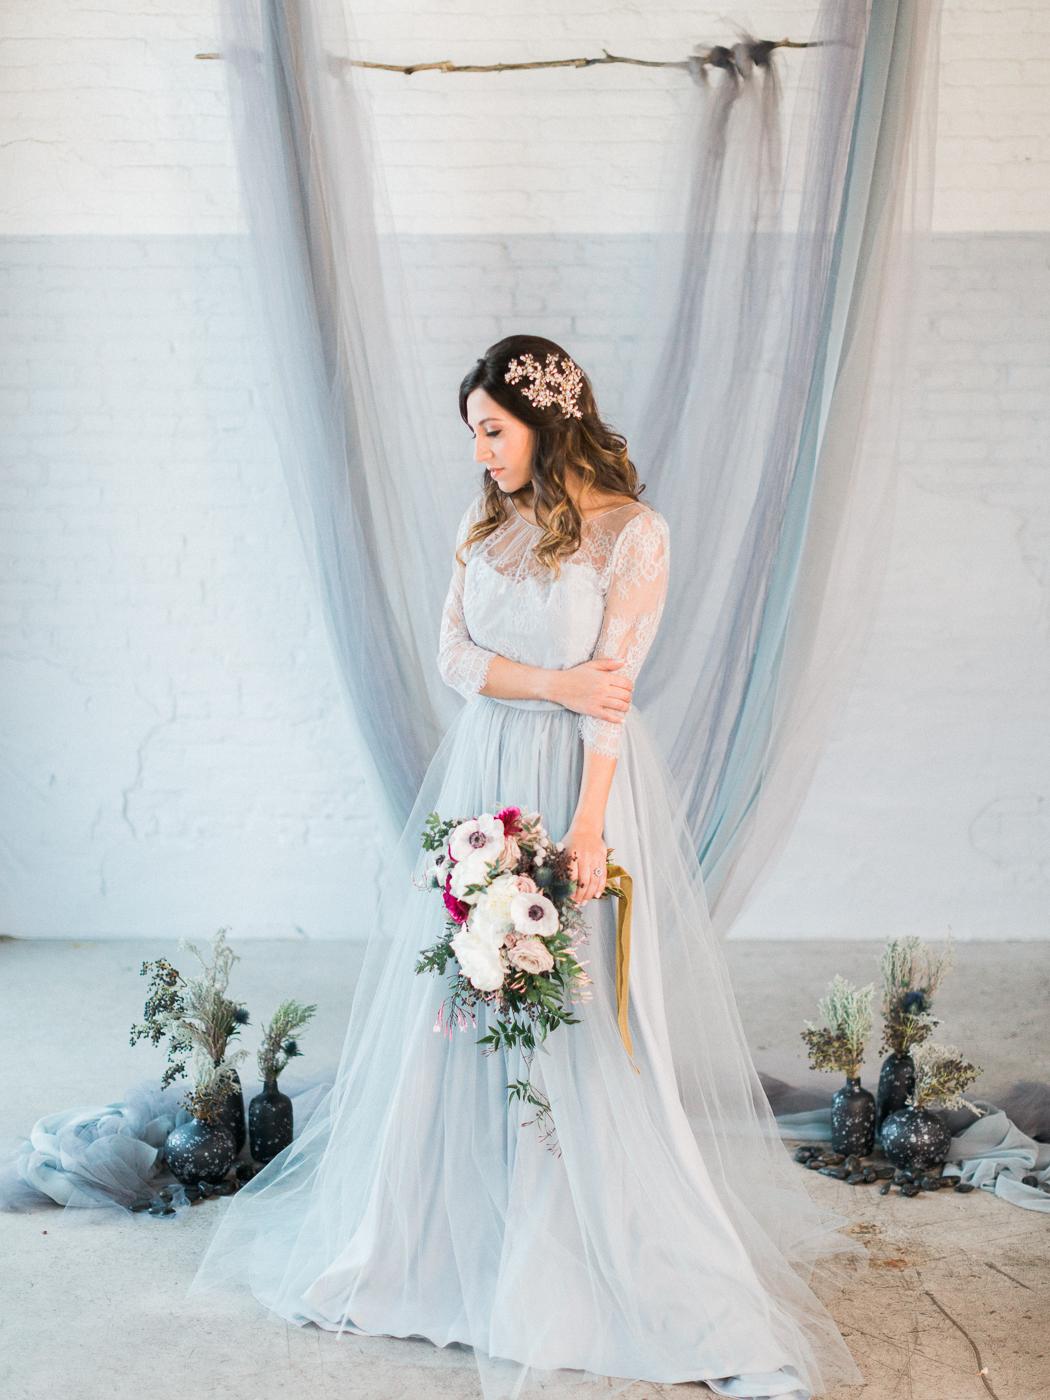 Misty Winter Coast Brooklyn Wedding Shoot-70.jpg